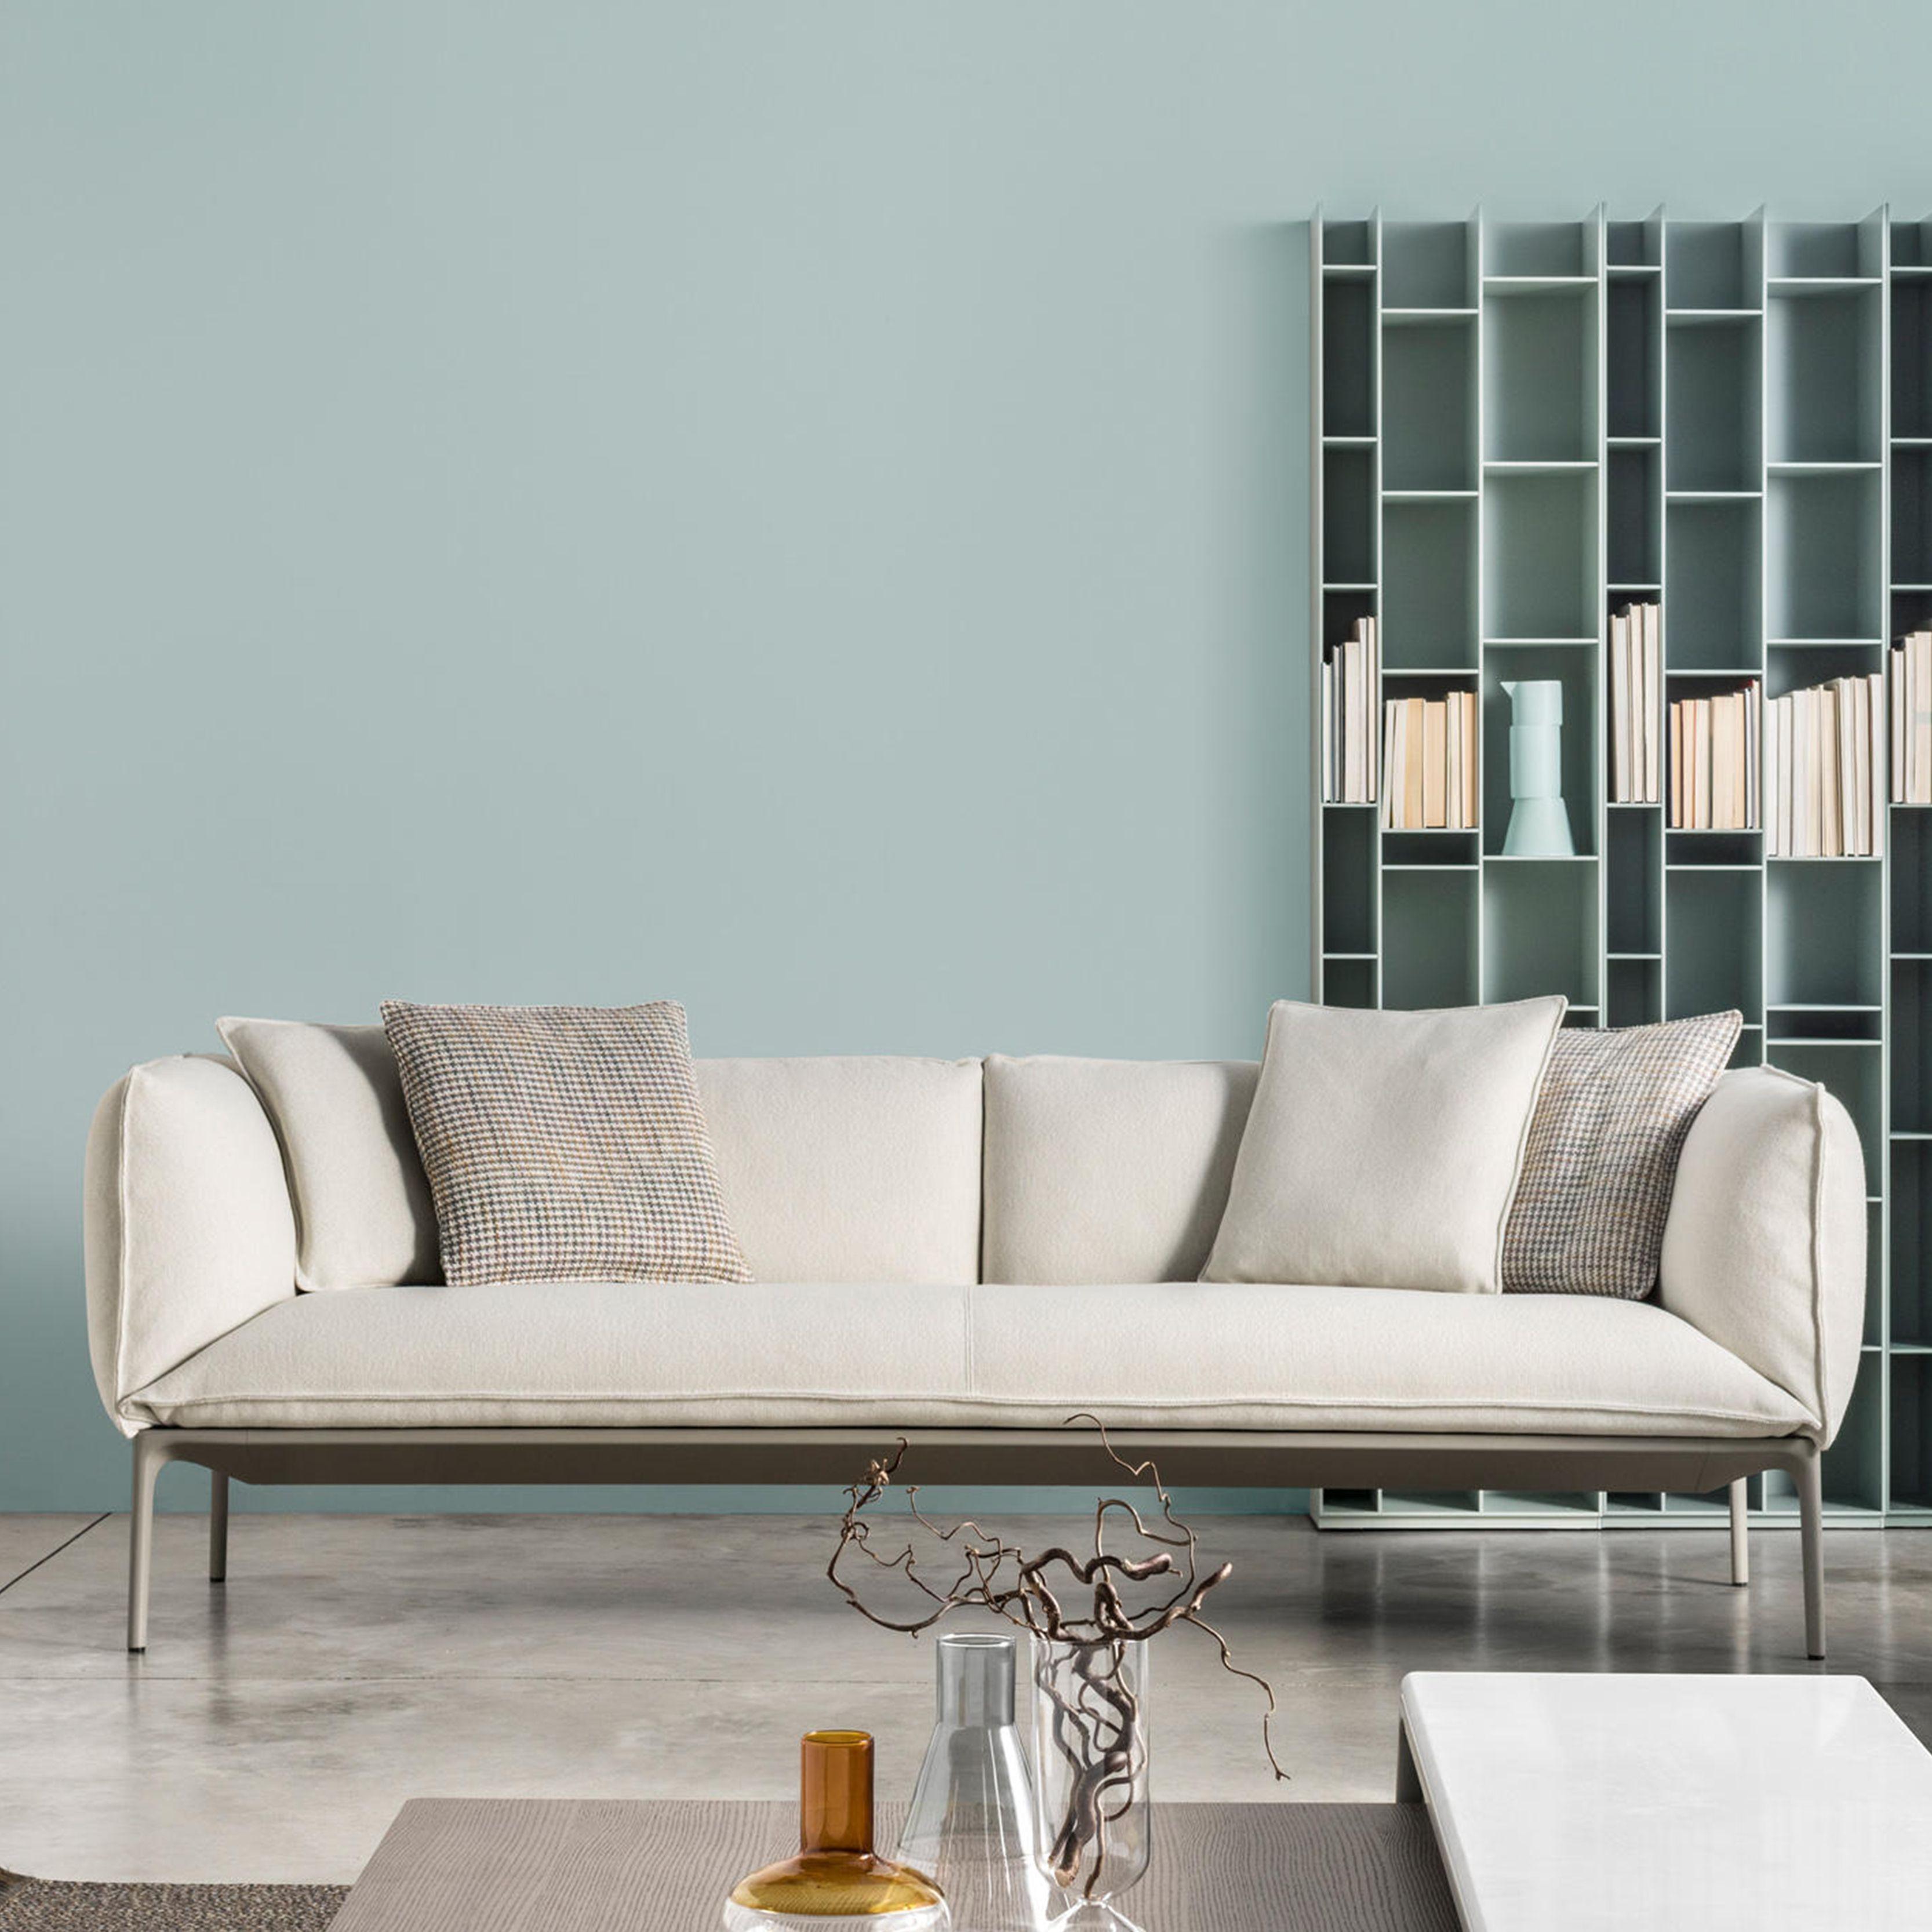 Luxury And Premium Italian Furniture Brands In India Premium And Luxury Italian Furniture Brands Italian Furniture Brands Luxury Italian Furniture Furniture